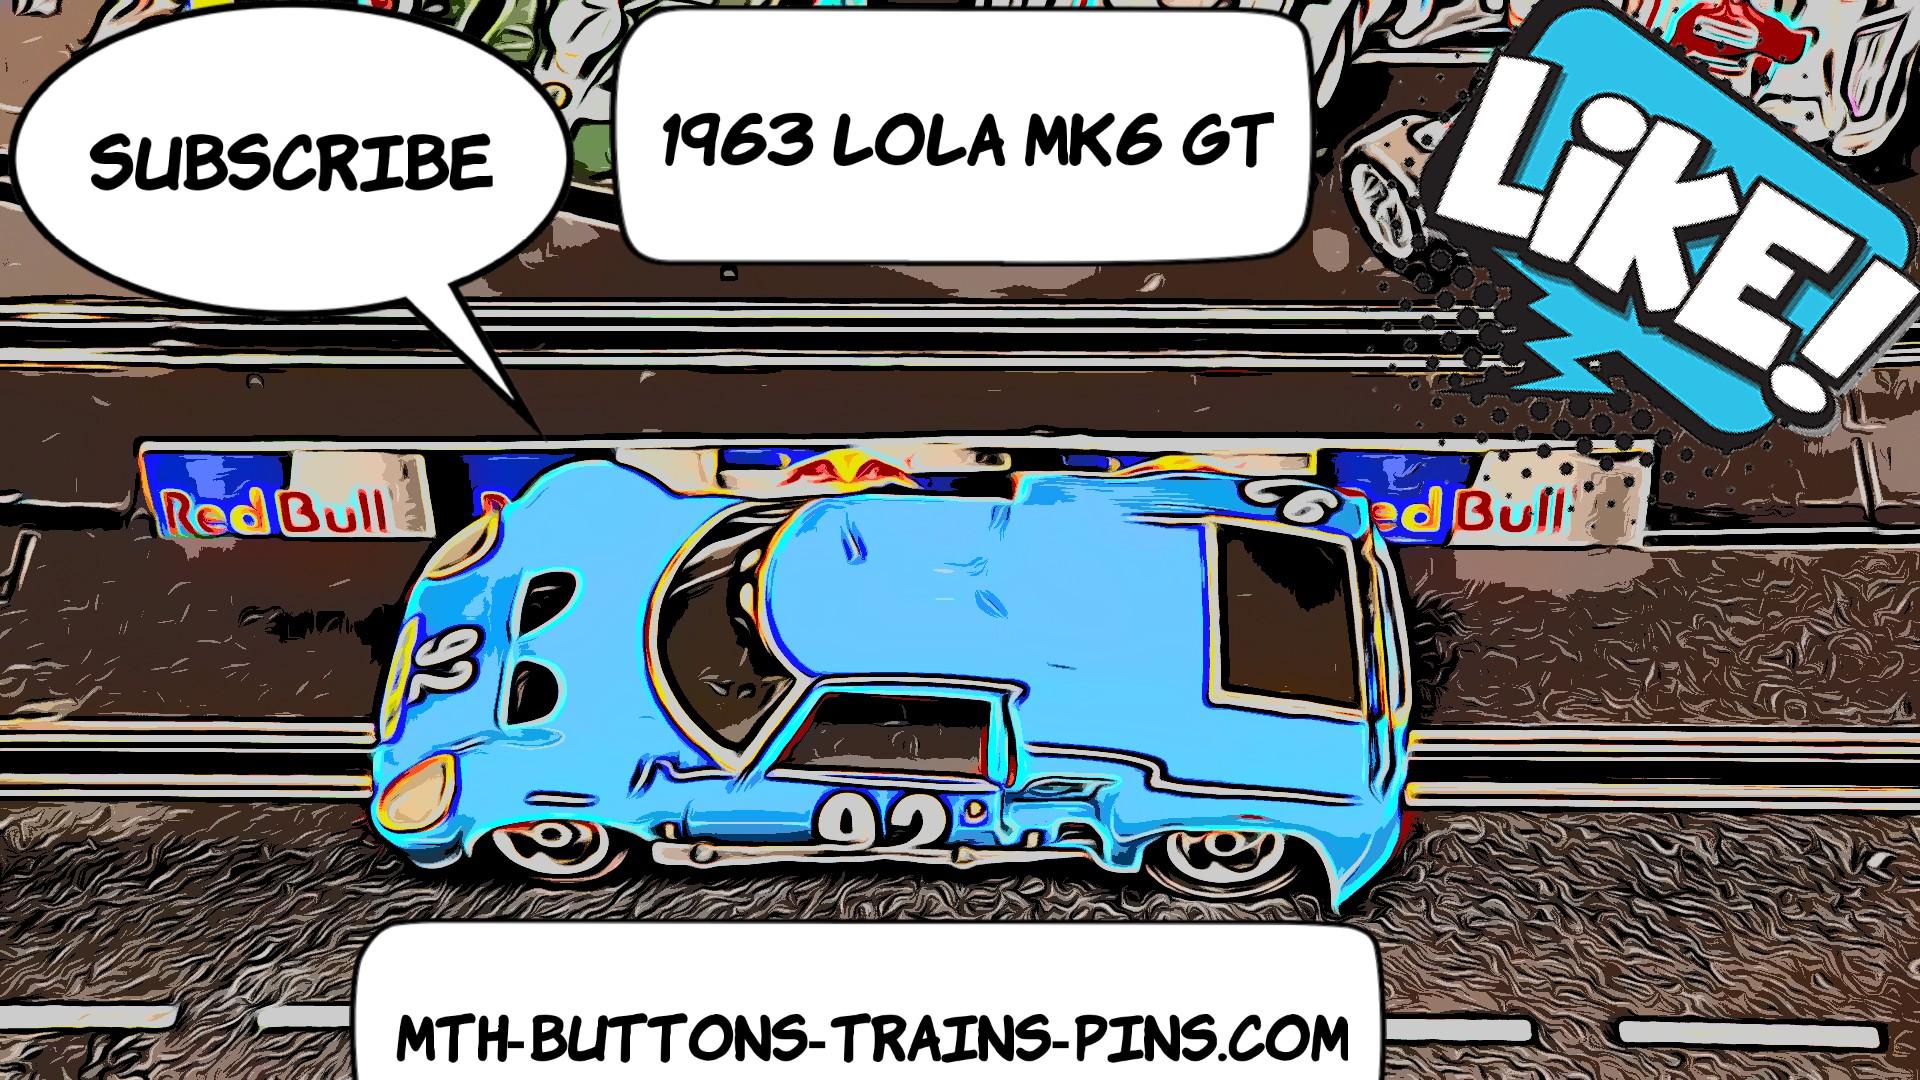 * SOLD * * SALE * 1963 Lola Mk6 GT Dynamic Slot Car 1/24 Scale #92